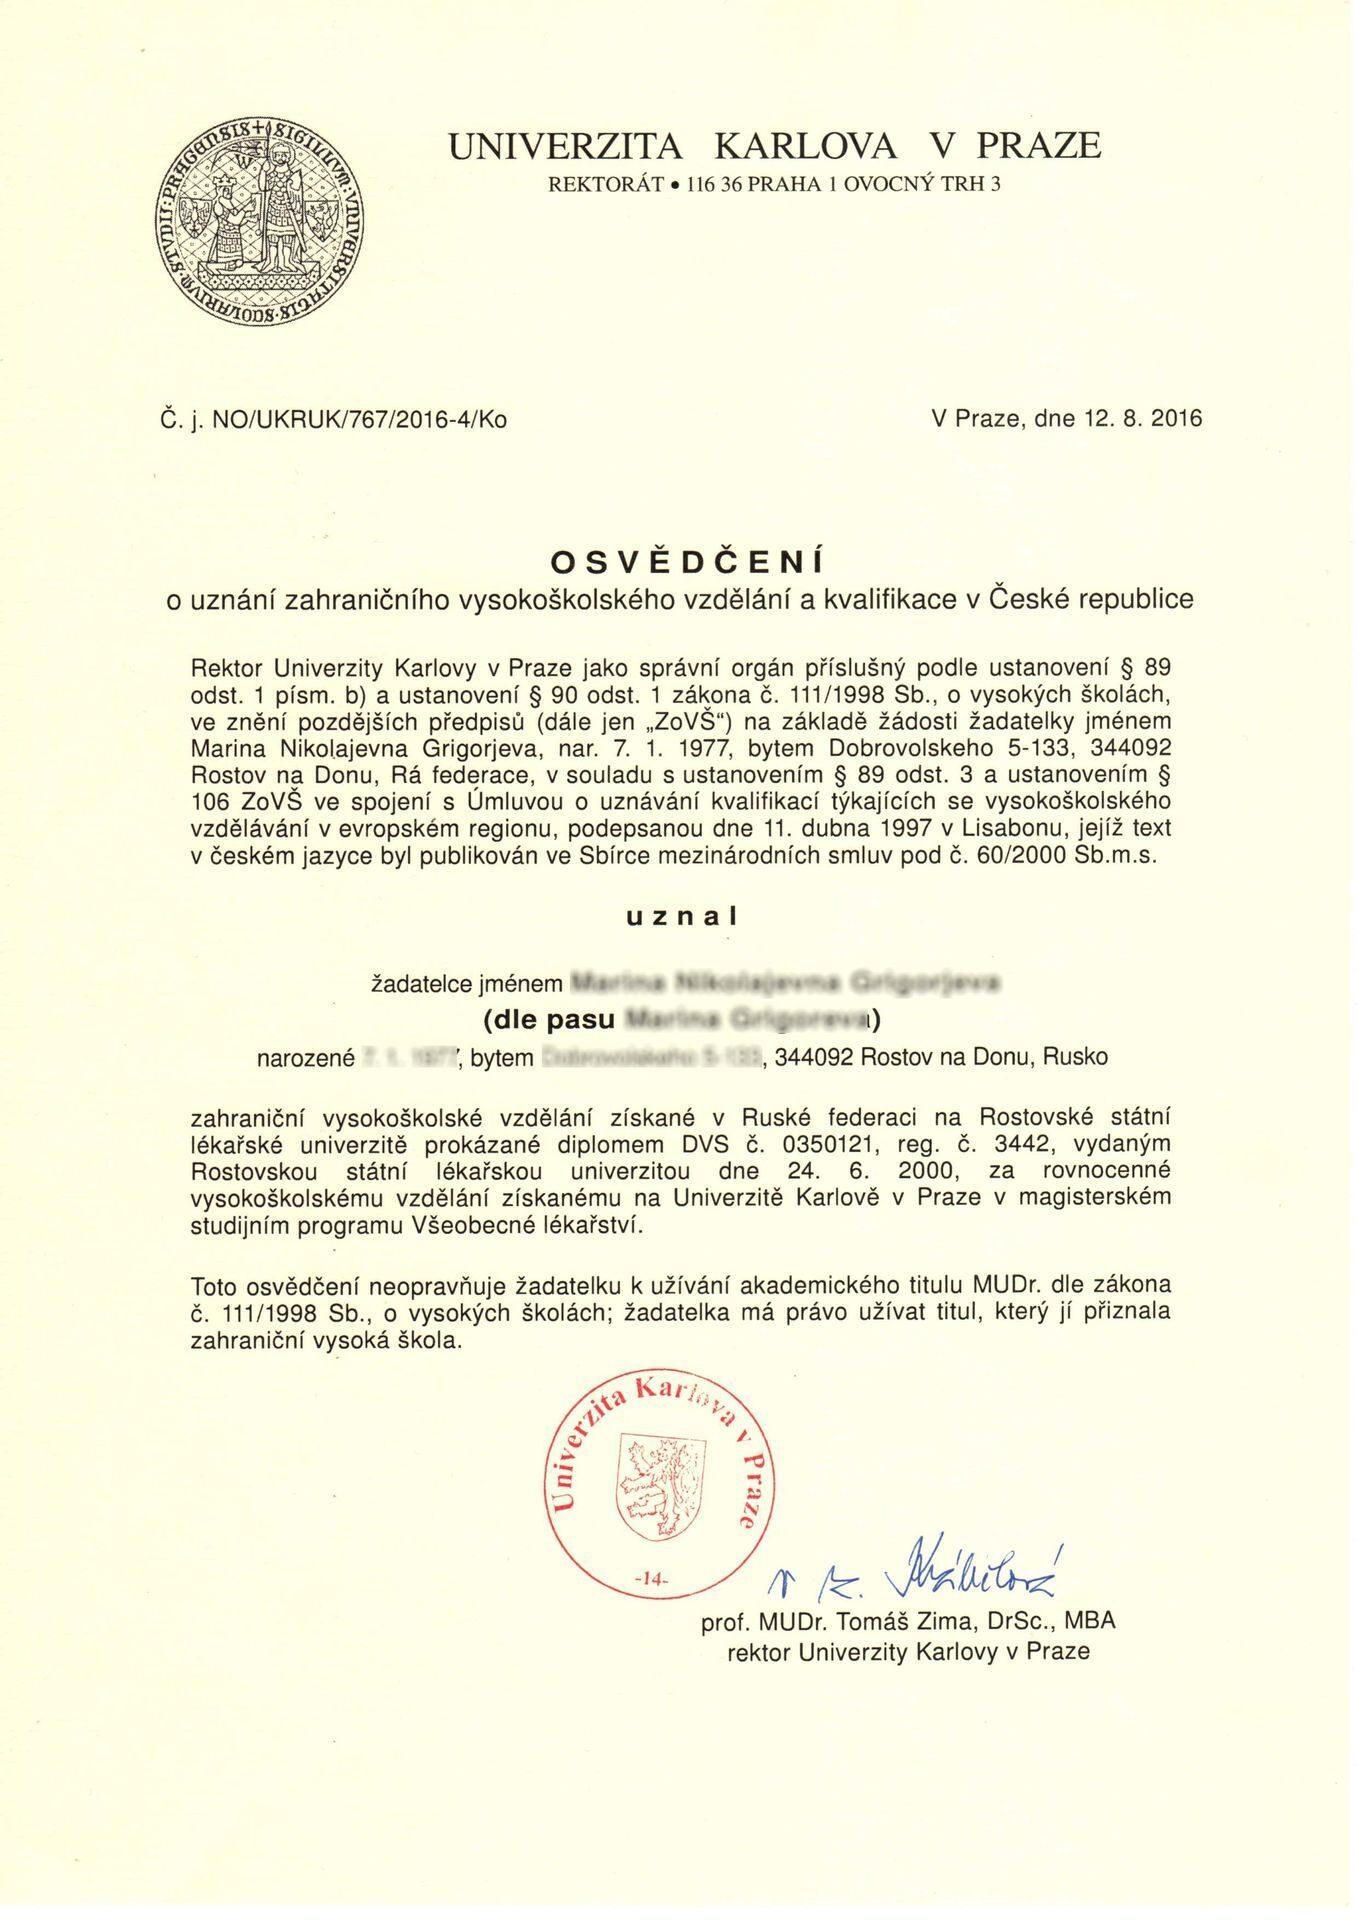 НОСТРИФИКАЦИЯ МЕДИЦИНСКОГО ДИПЛОМА nostrifikace grigireva003